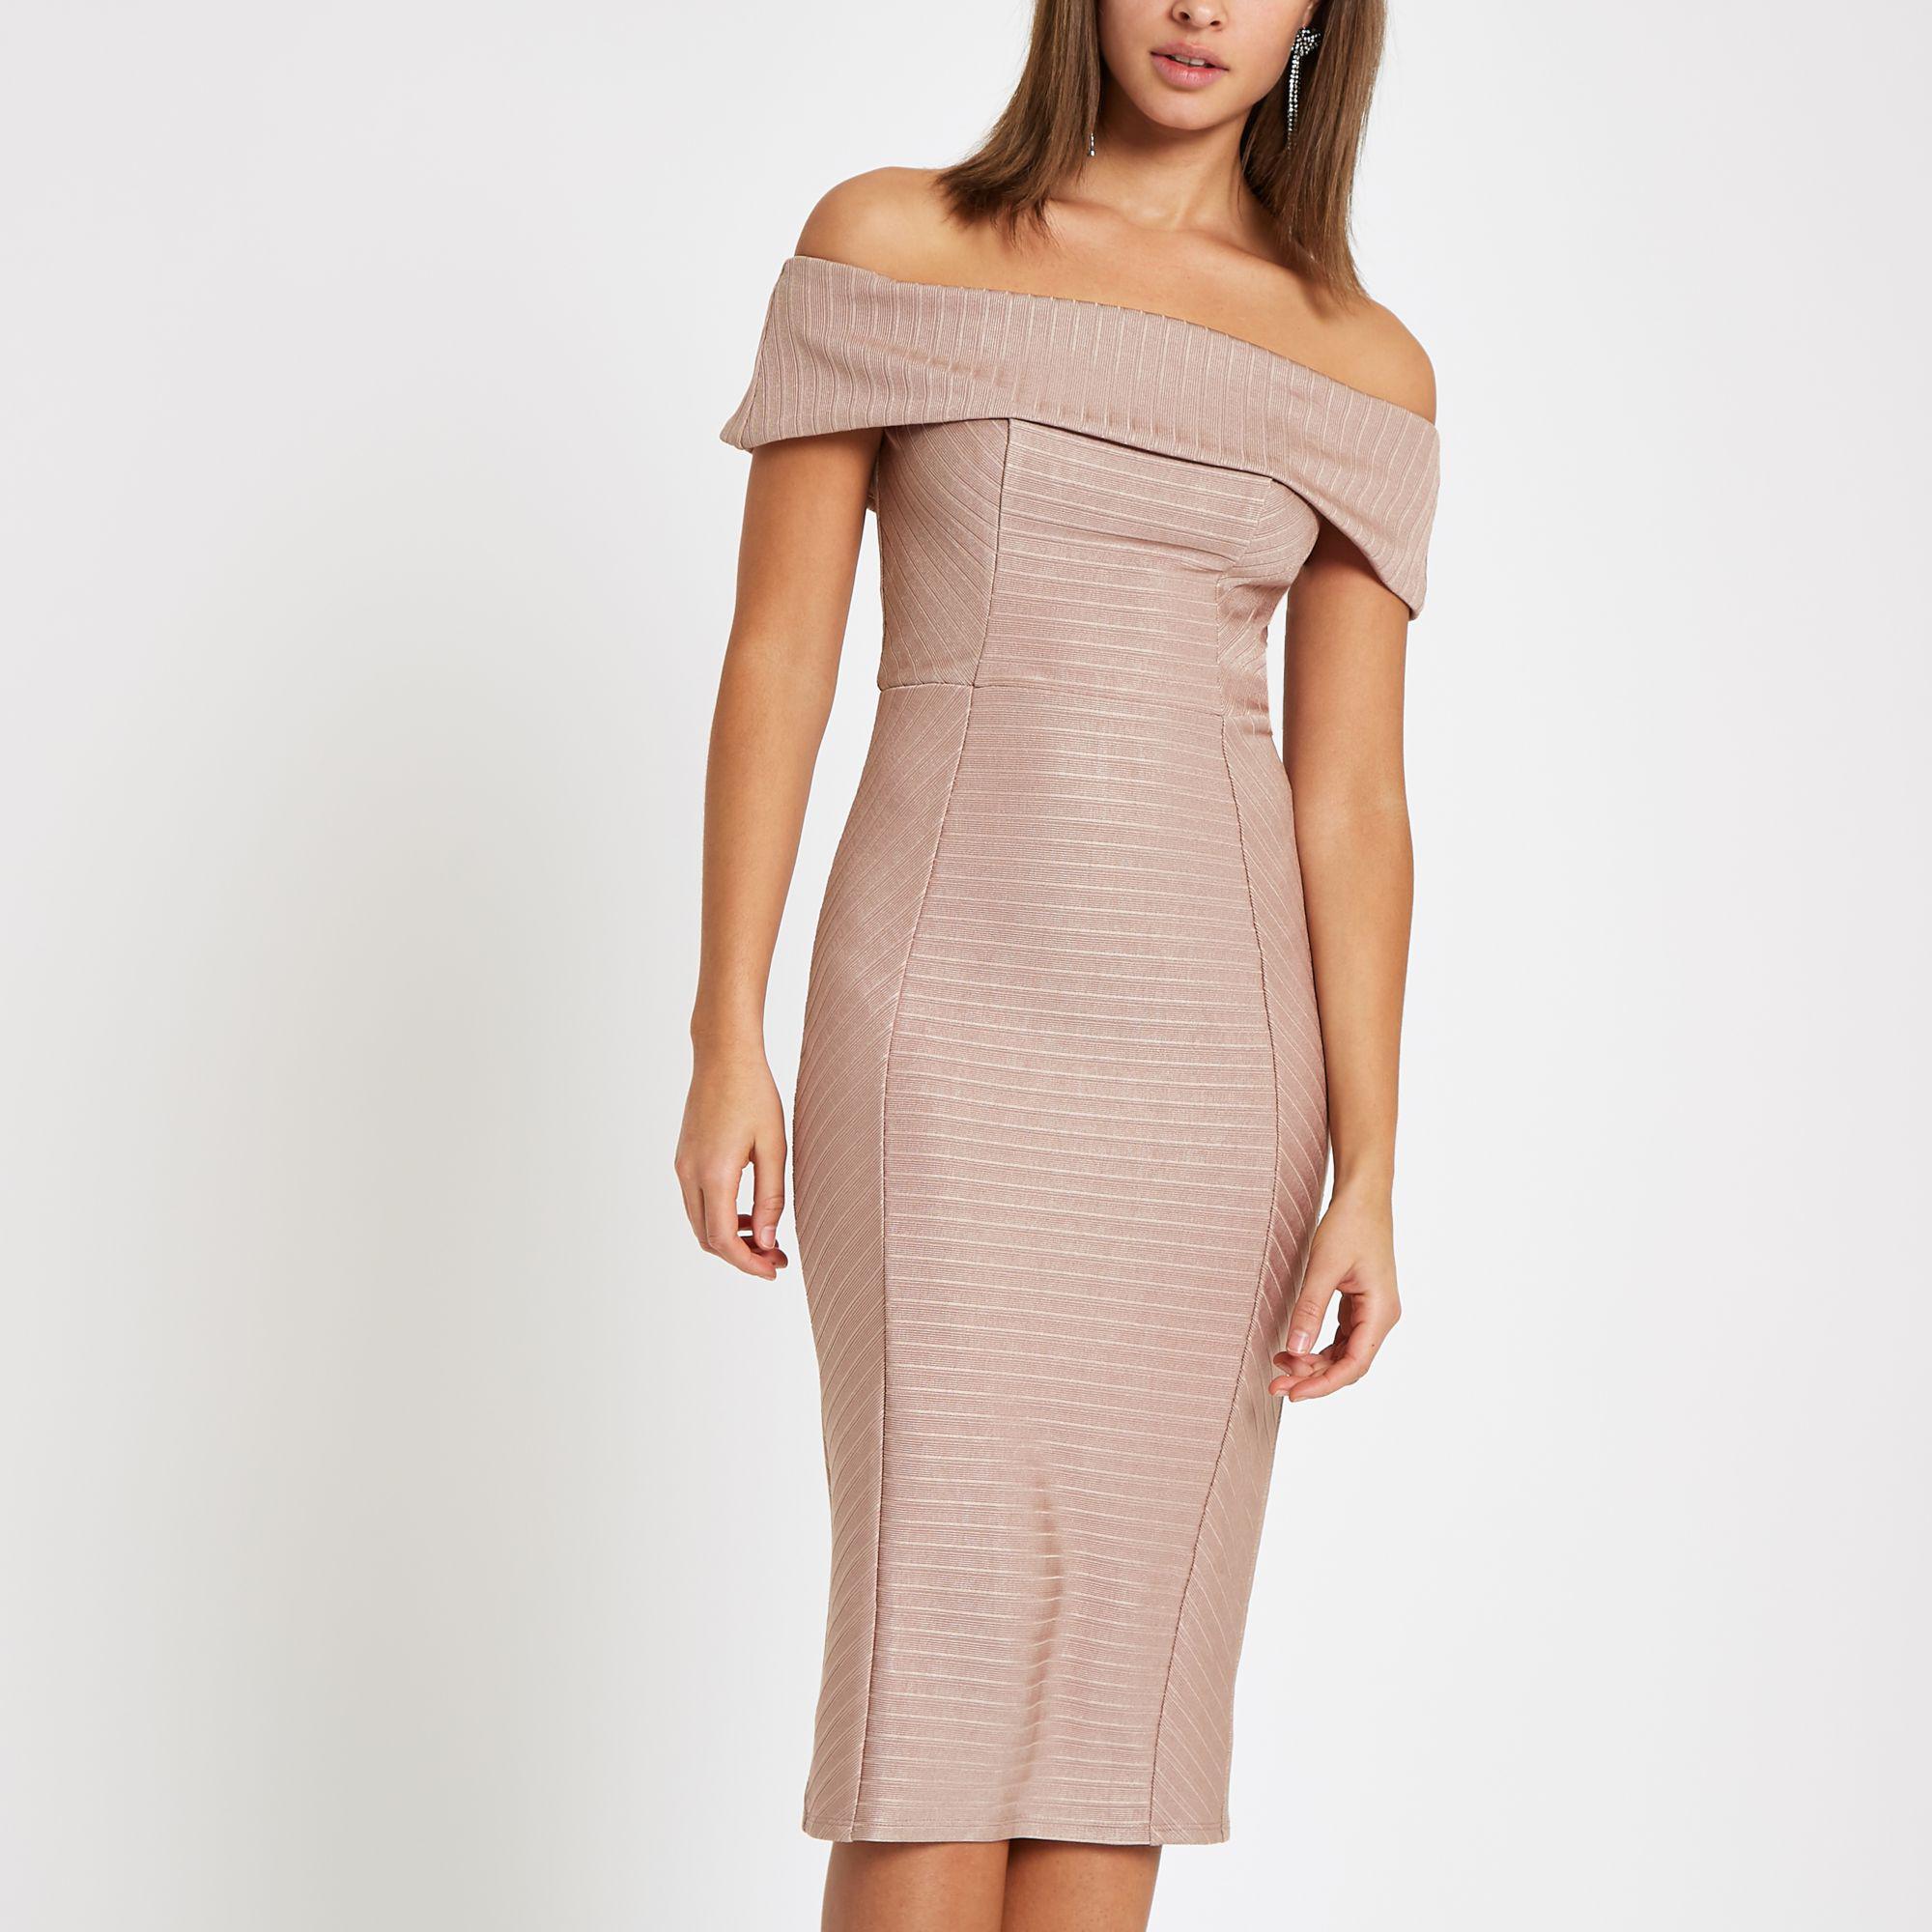 457d8980ed752 Lyst - River Island Light Pink Bardot Bandage Mini Bodycon Dress in Pink